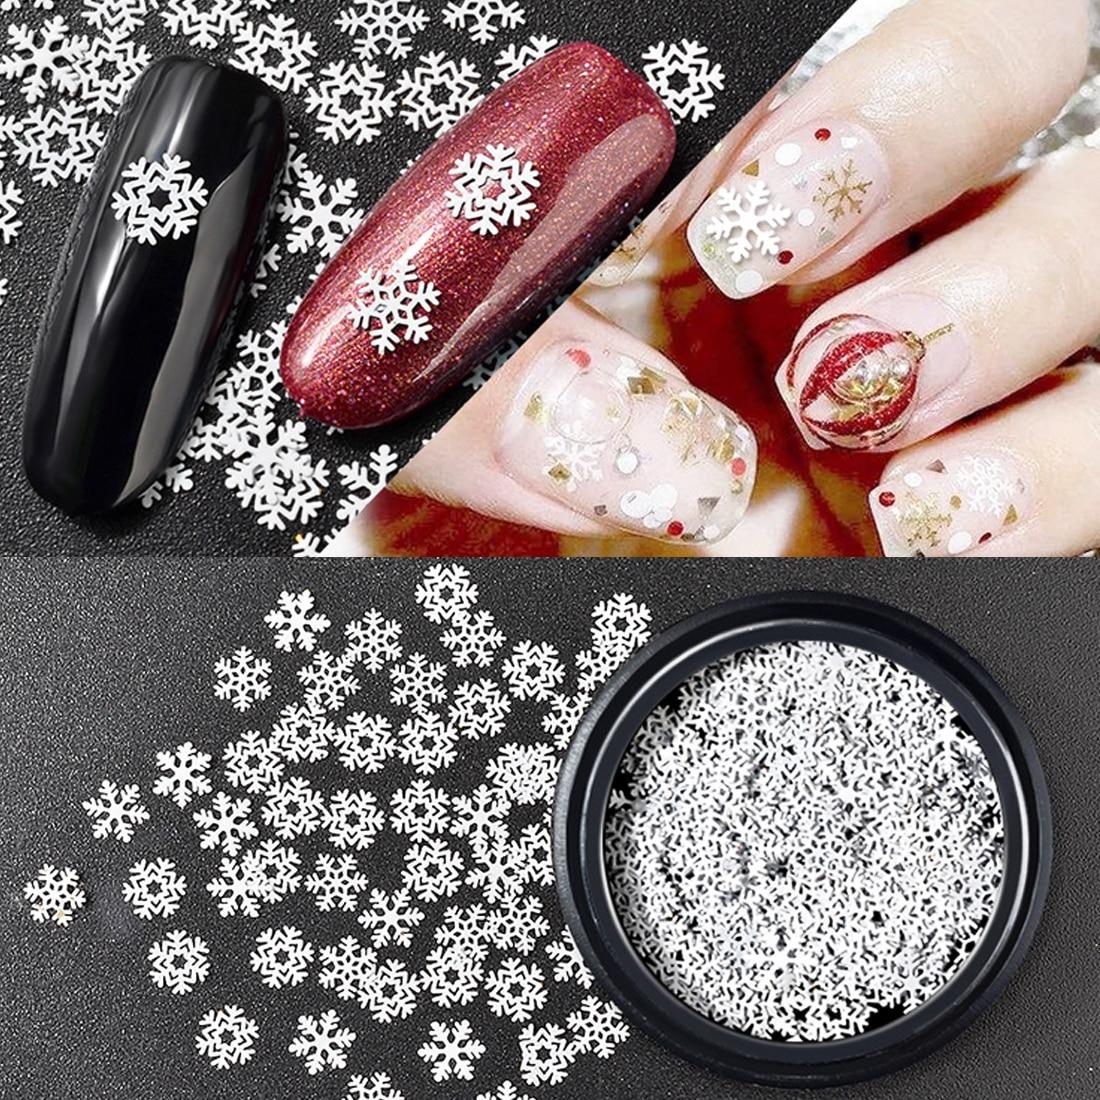 2019 Mode Mix Szie 3 Muster Nail Art Dekoration 1 Box 1,5g Weihnachten Metall Schneeflocke Nagel Pailletten Winter Weihnachten Paillette Weiß Flake Nails Art & Werkzeuge